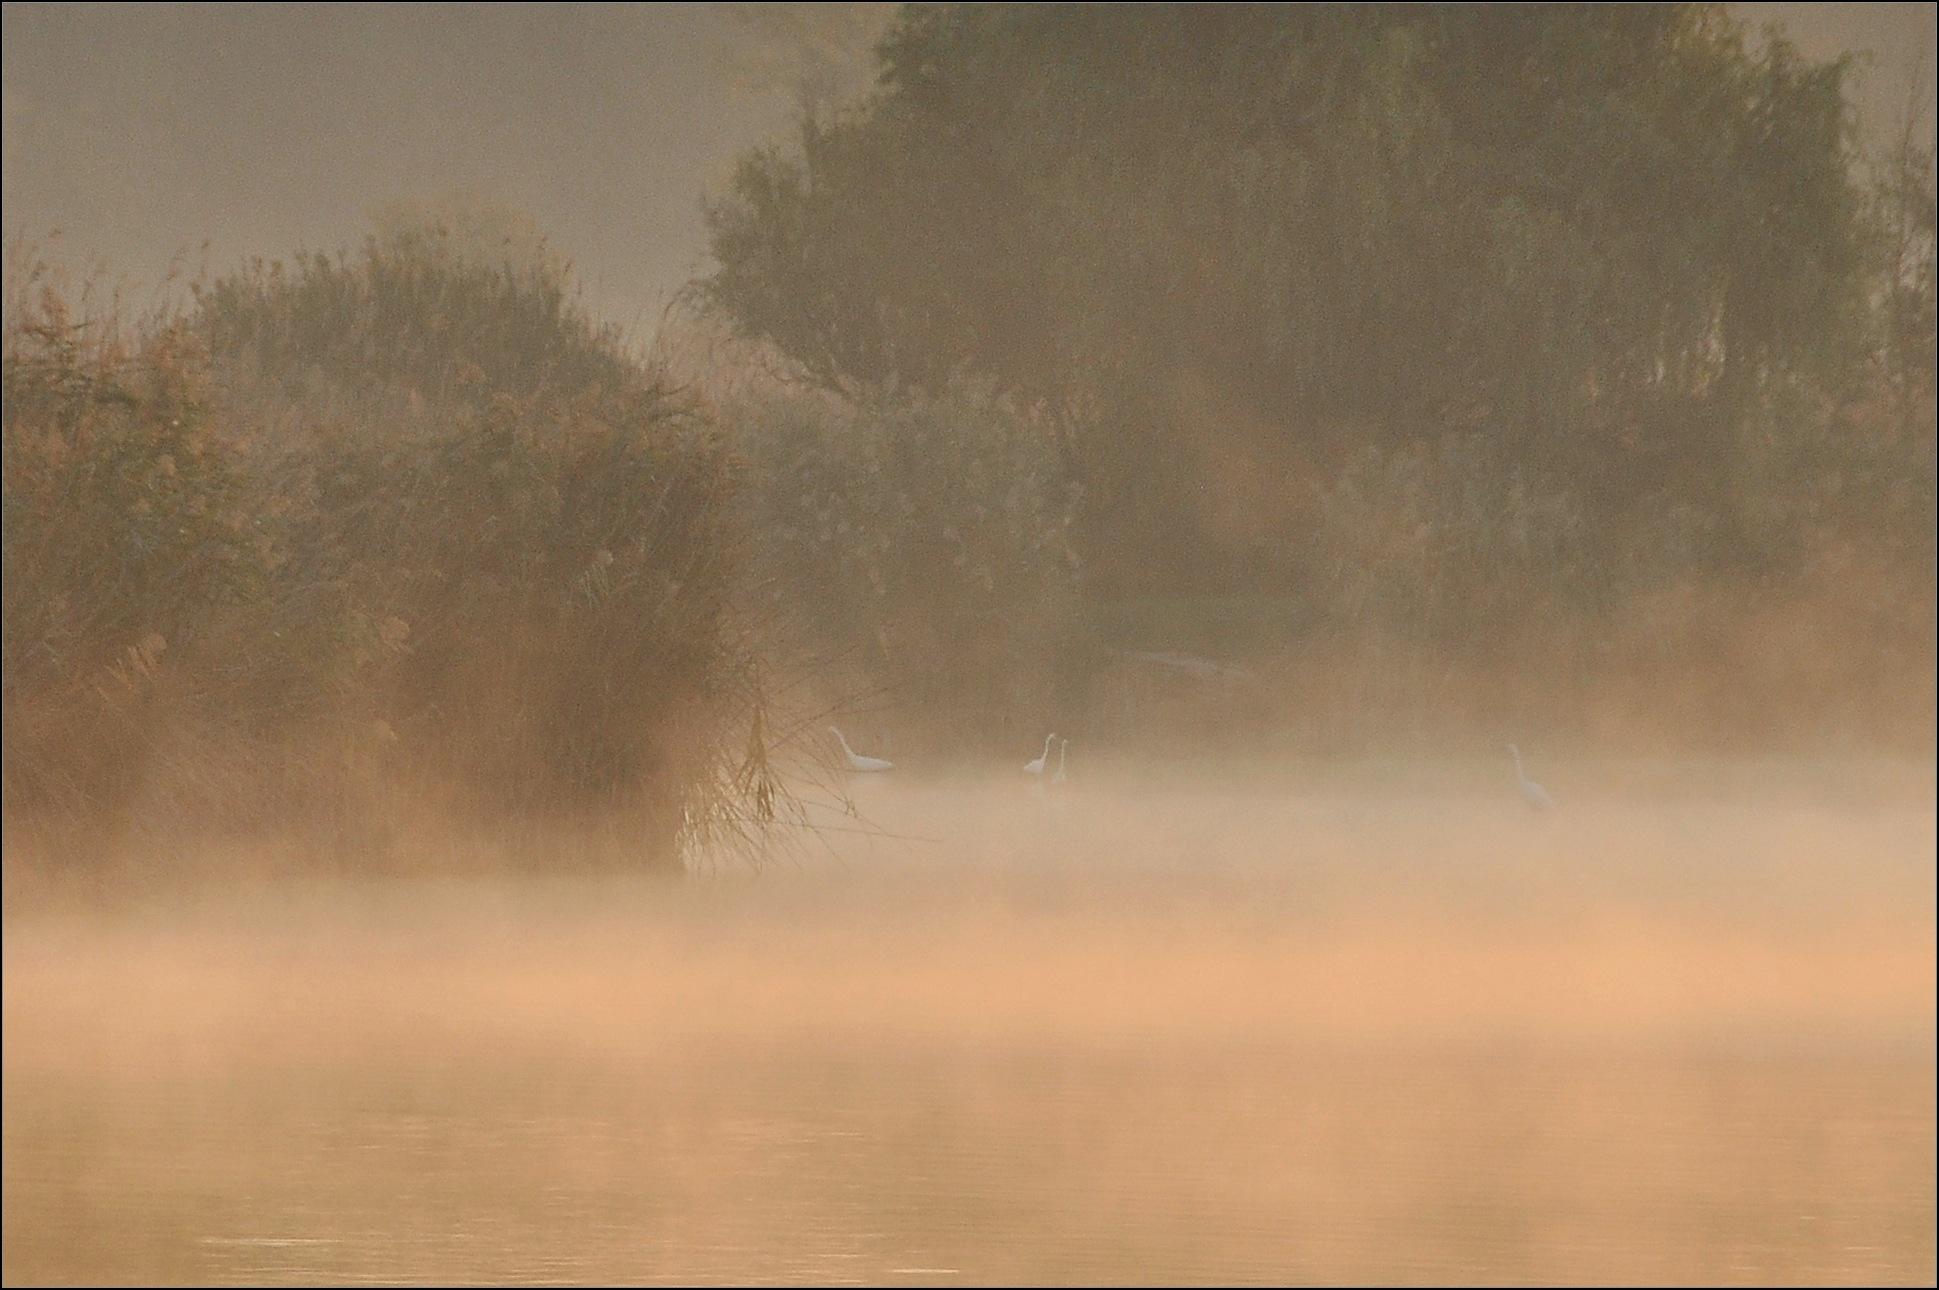 foggy dawn by zdenkostricki